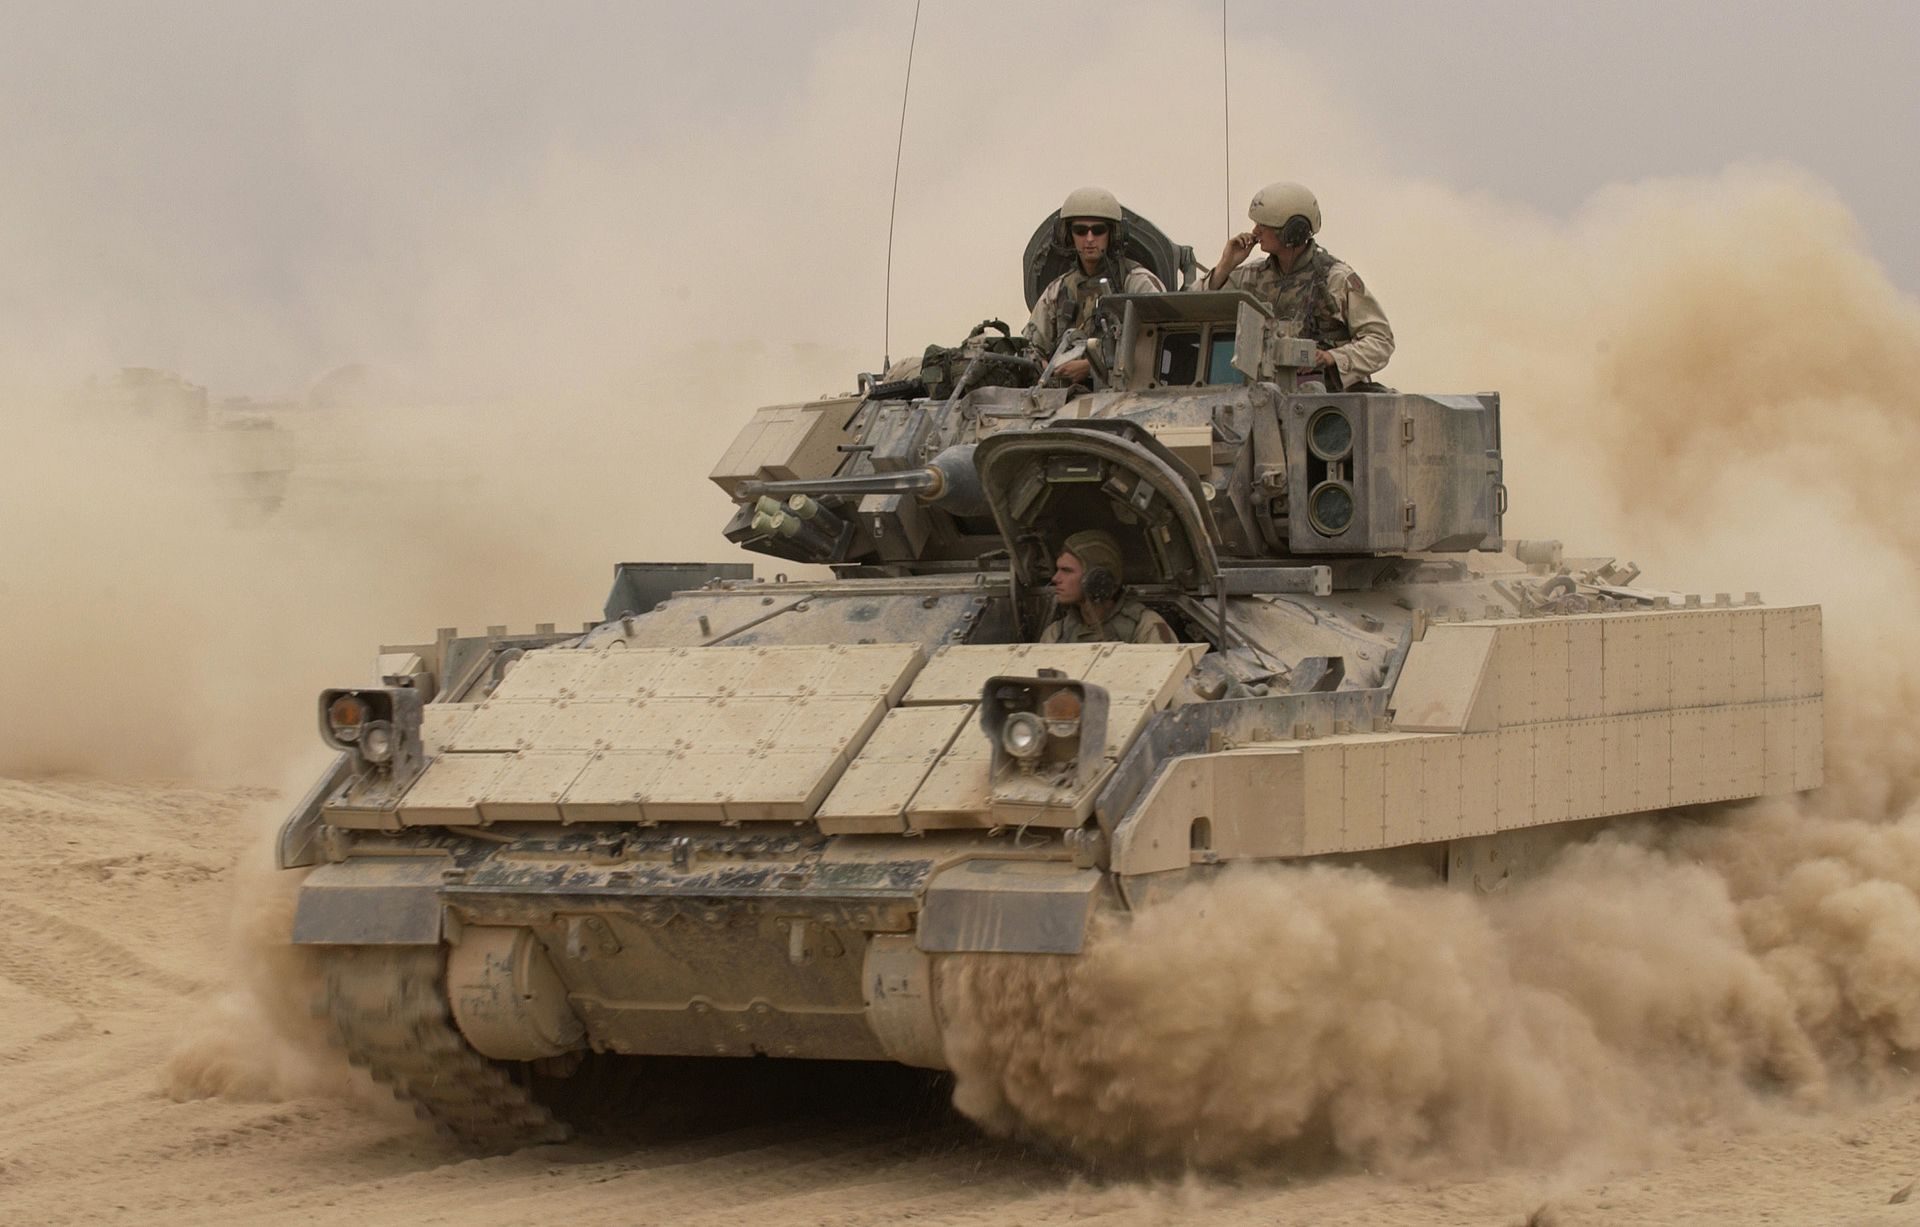 Bradley Fighting Vehicle - Wikipedia